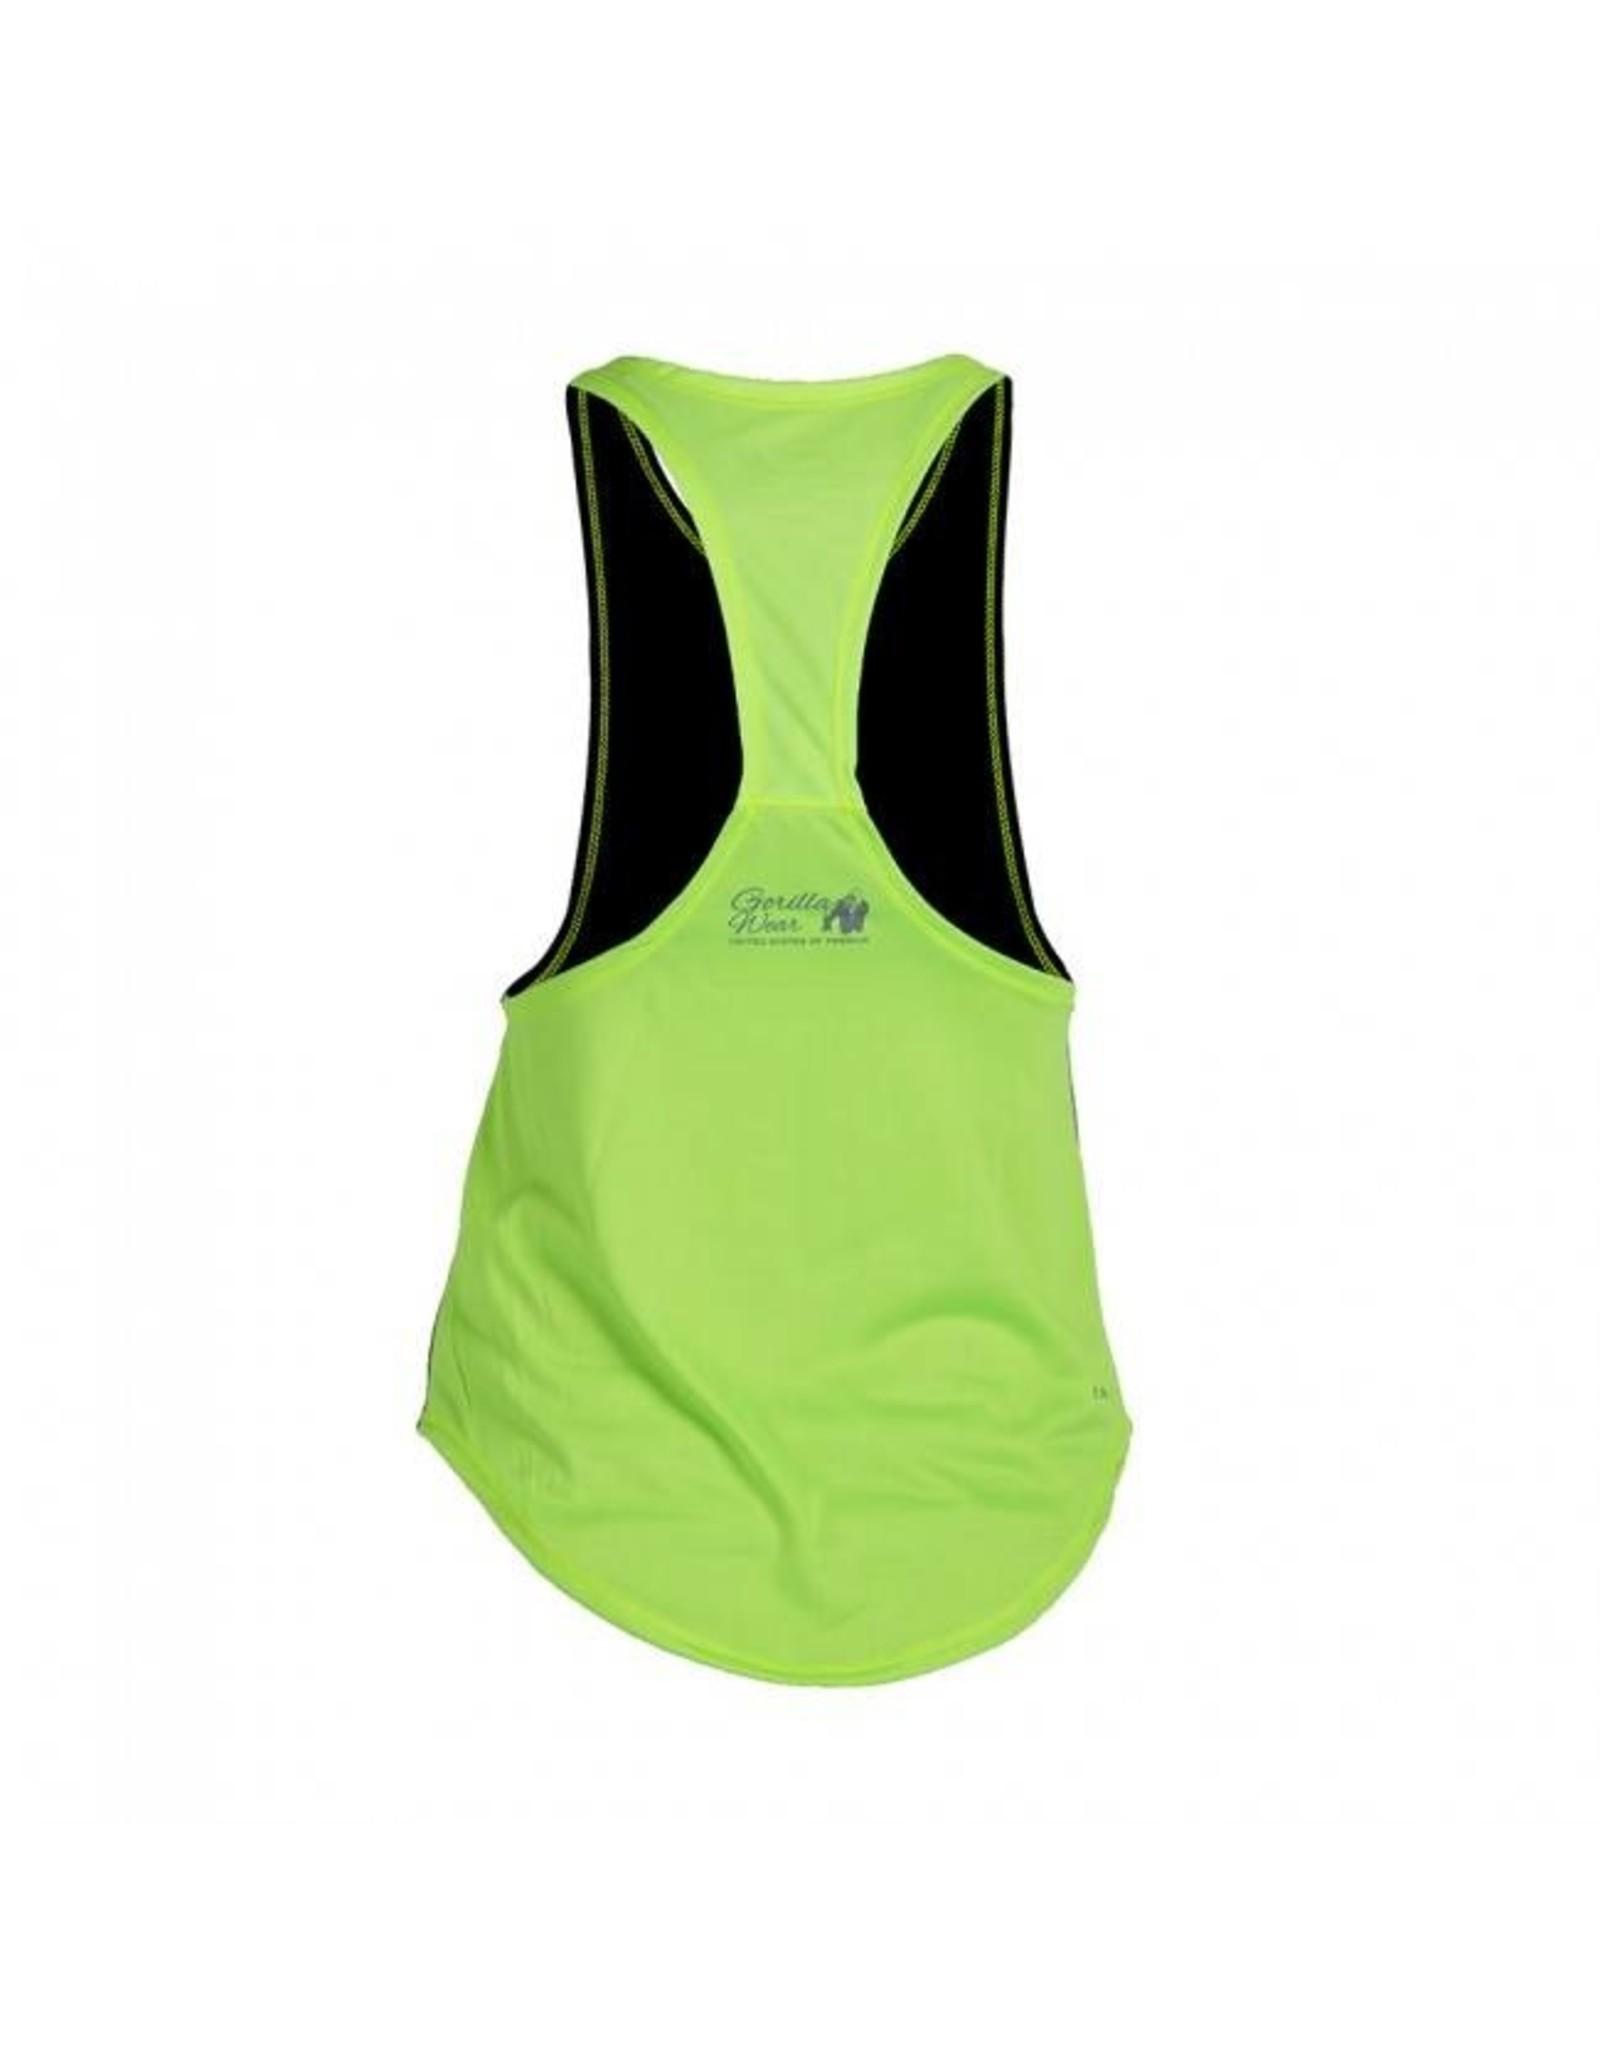 Gorilla Wear Stringer Tank Top - Black/Neon Lime